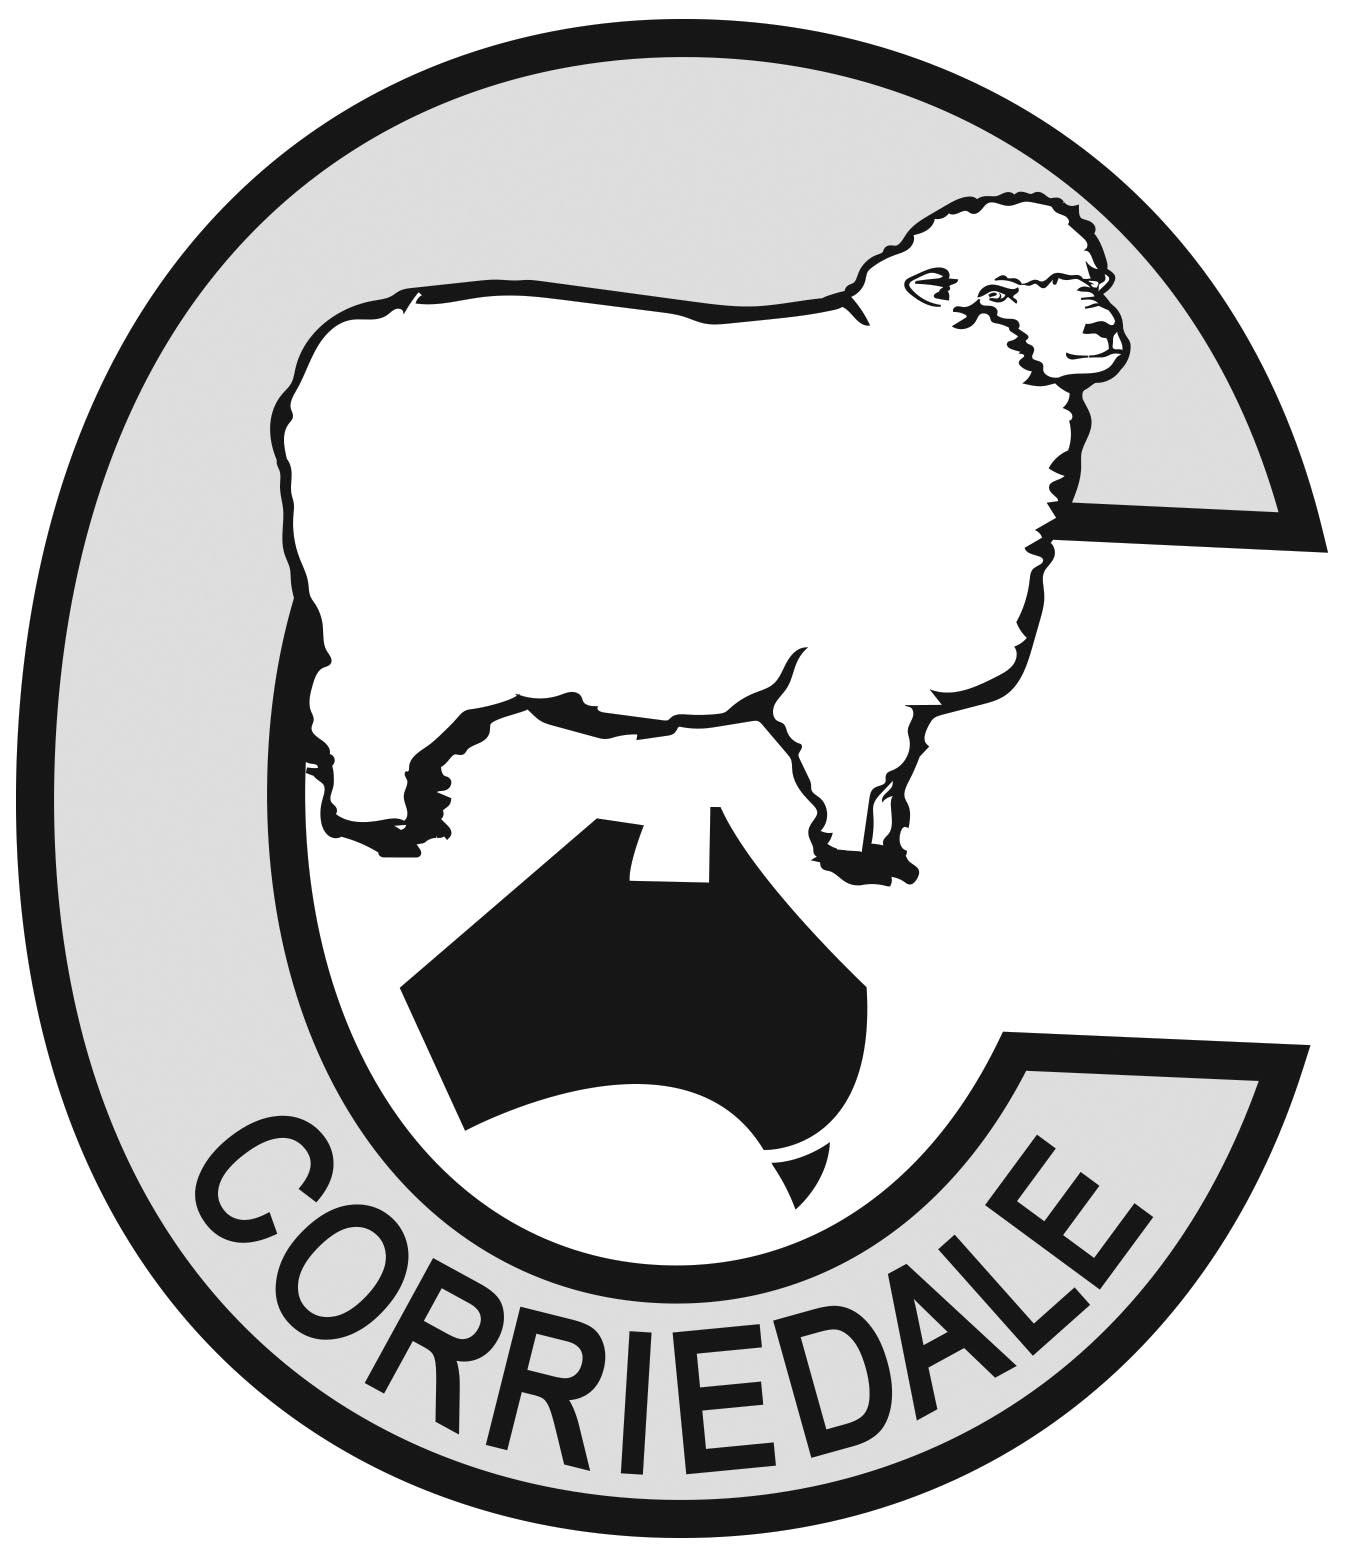 CORRIEDALE_LOGO_GSCALE.JPG